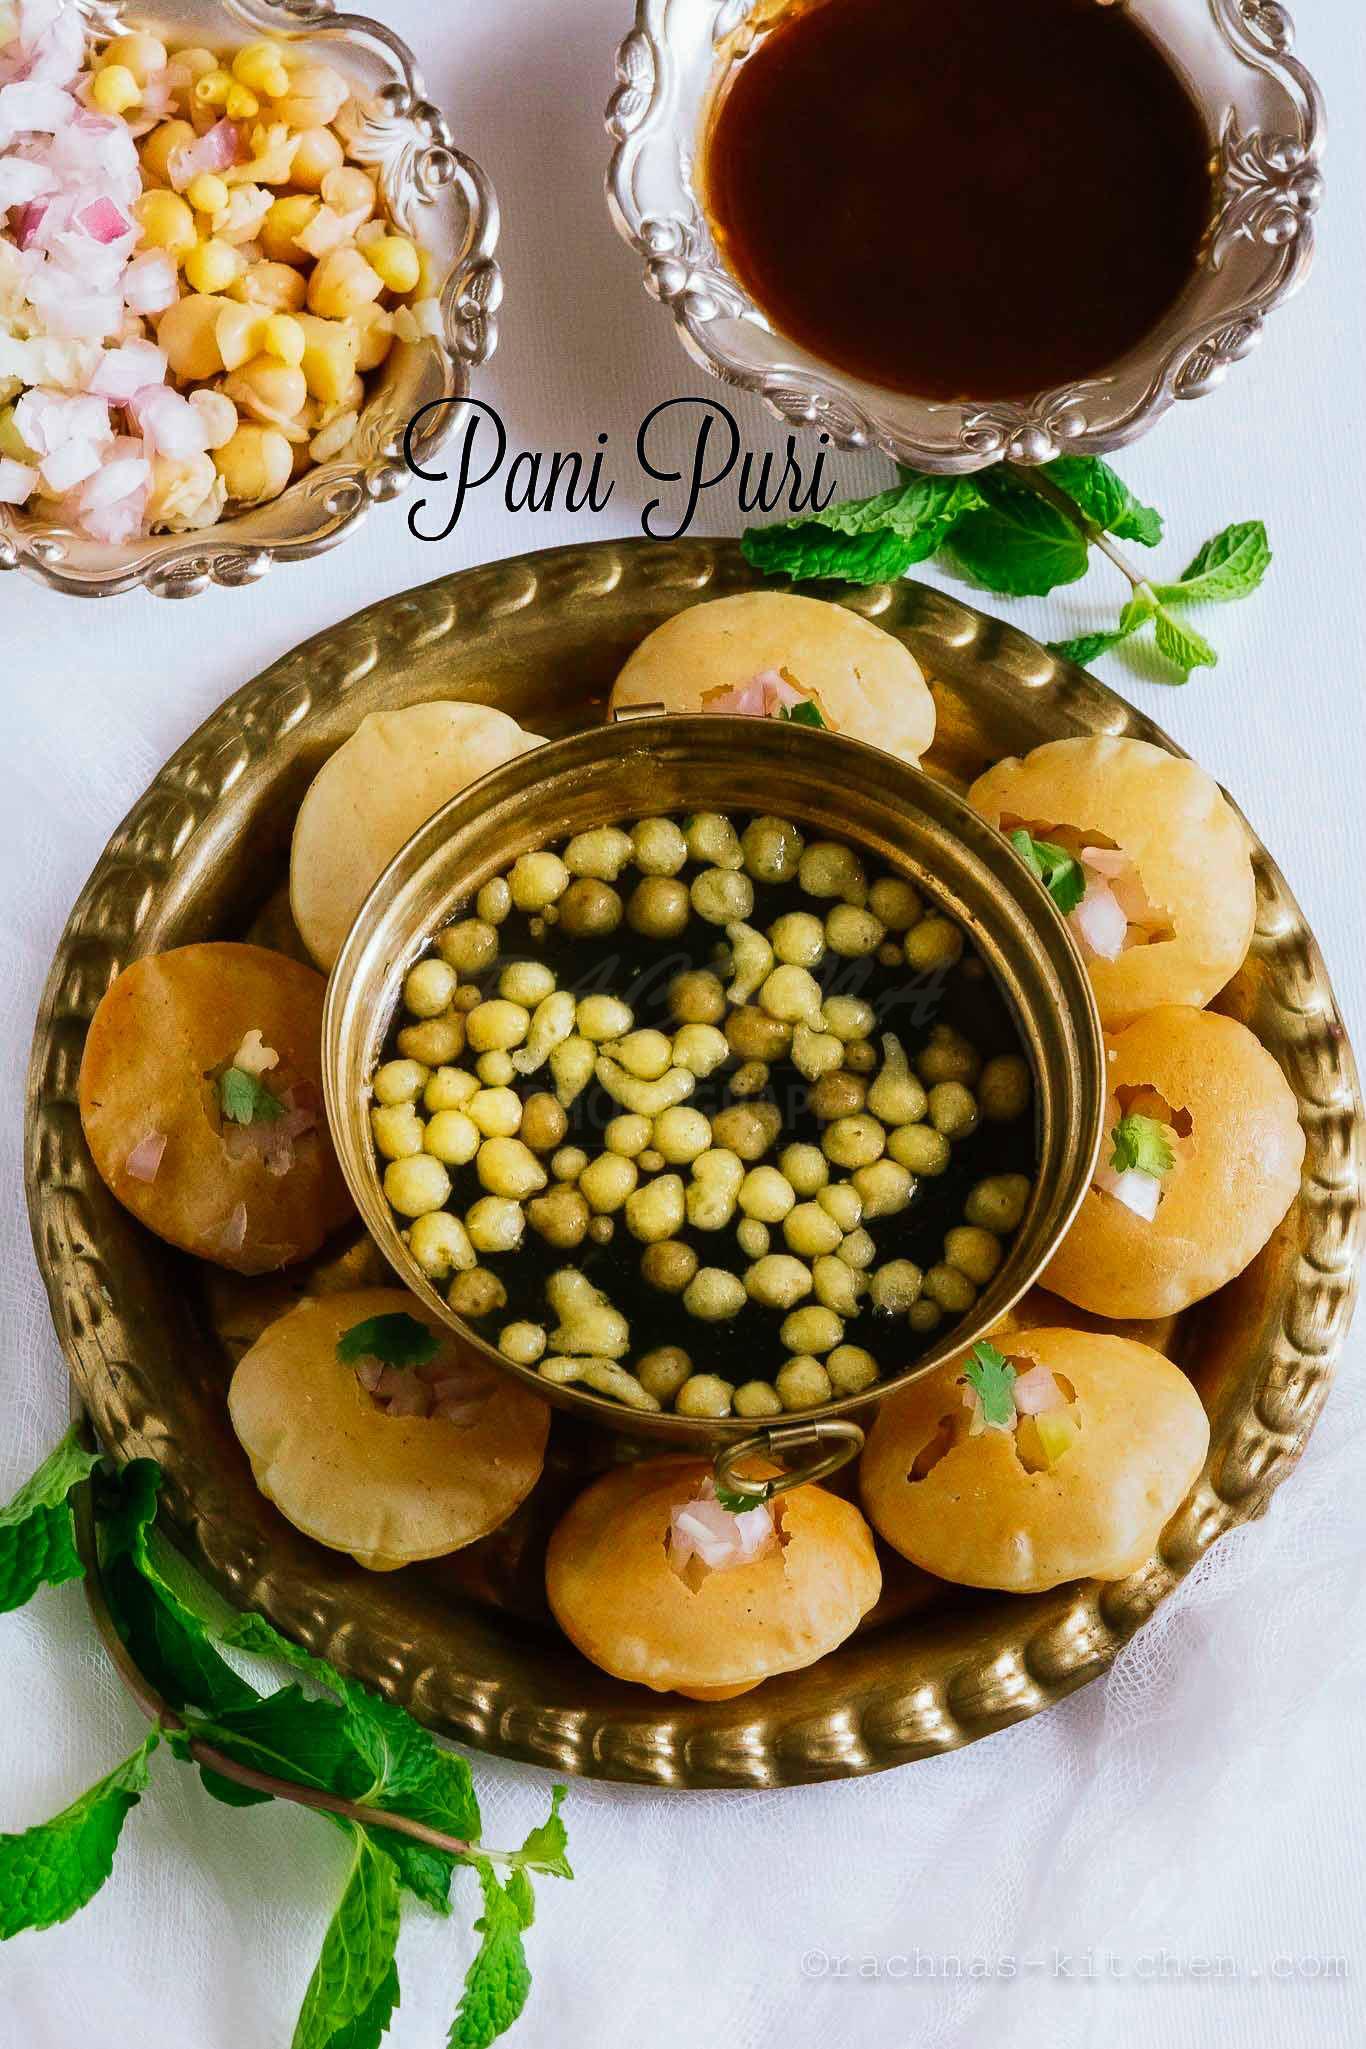 Pani puri recipe how to make best pani puri at home video recipe pani puri recipe forumfinder Choice Image